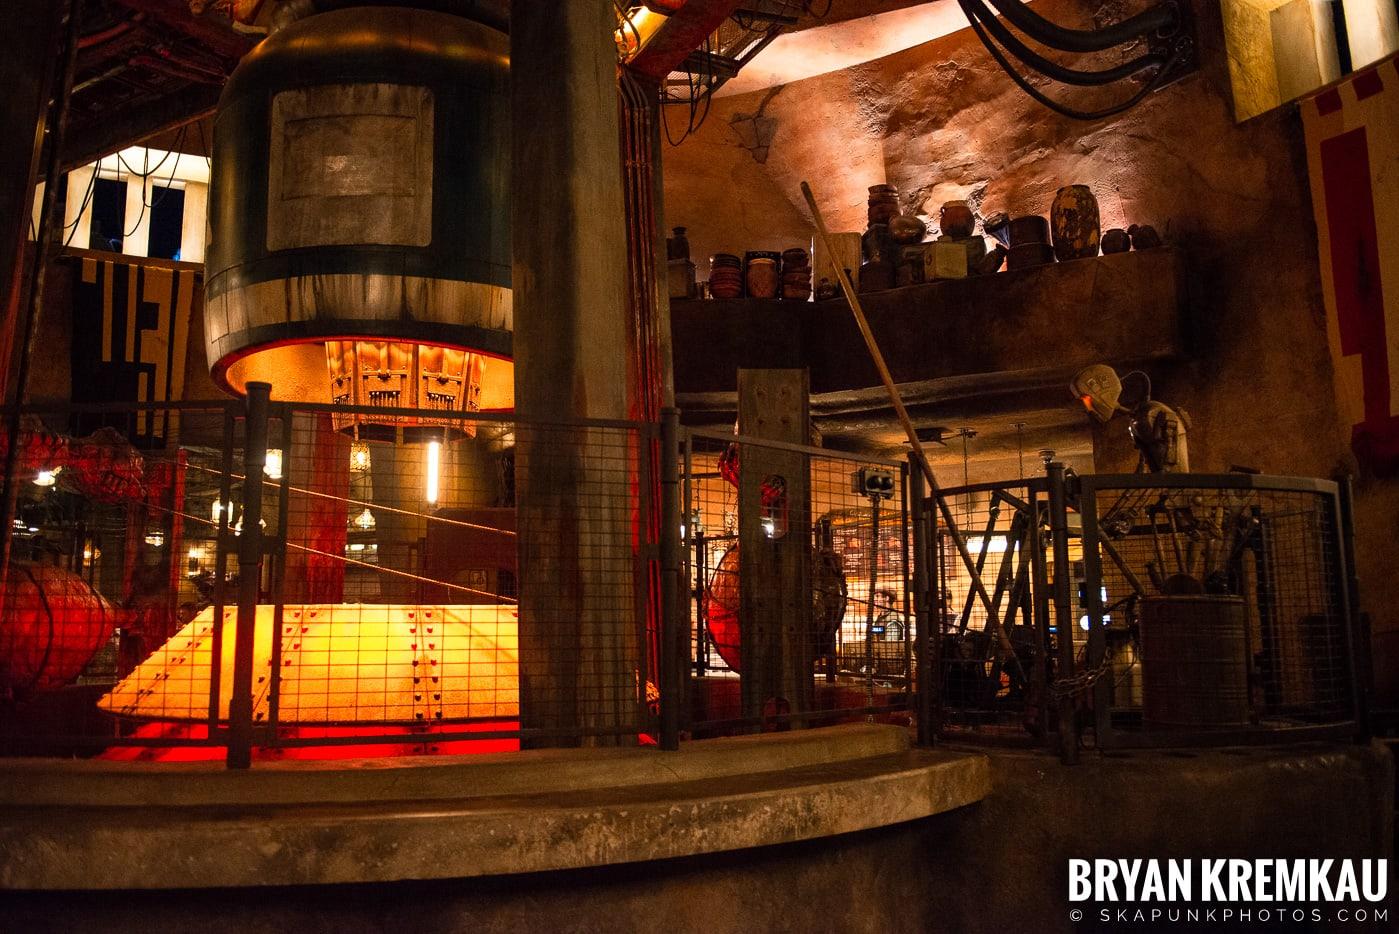 Walt Disney World Vacation: Day 5 (Animal Kingdom / Disney's Hollywood Studios) - 10.3.19 (31)